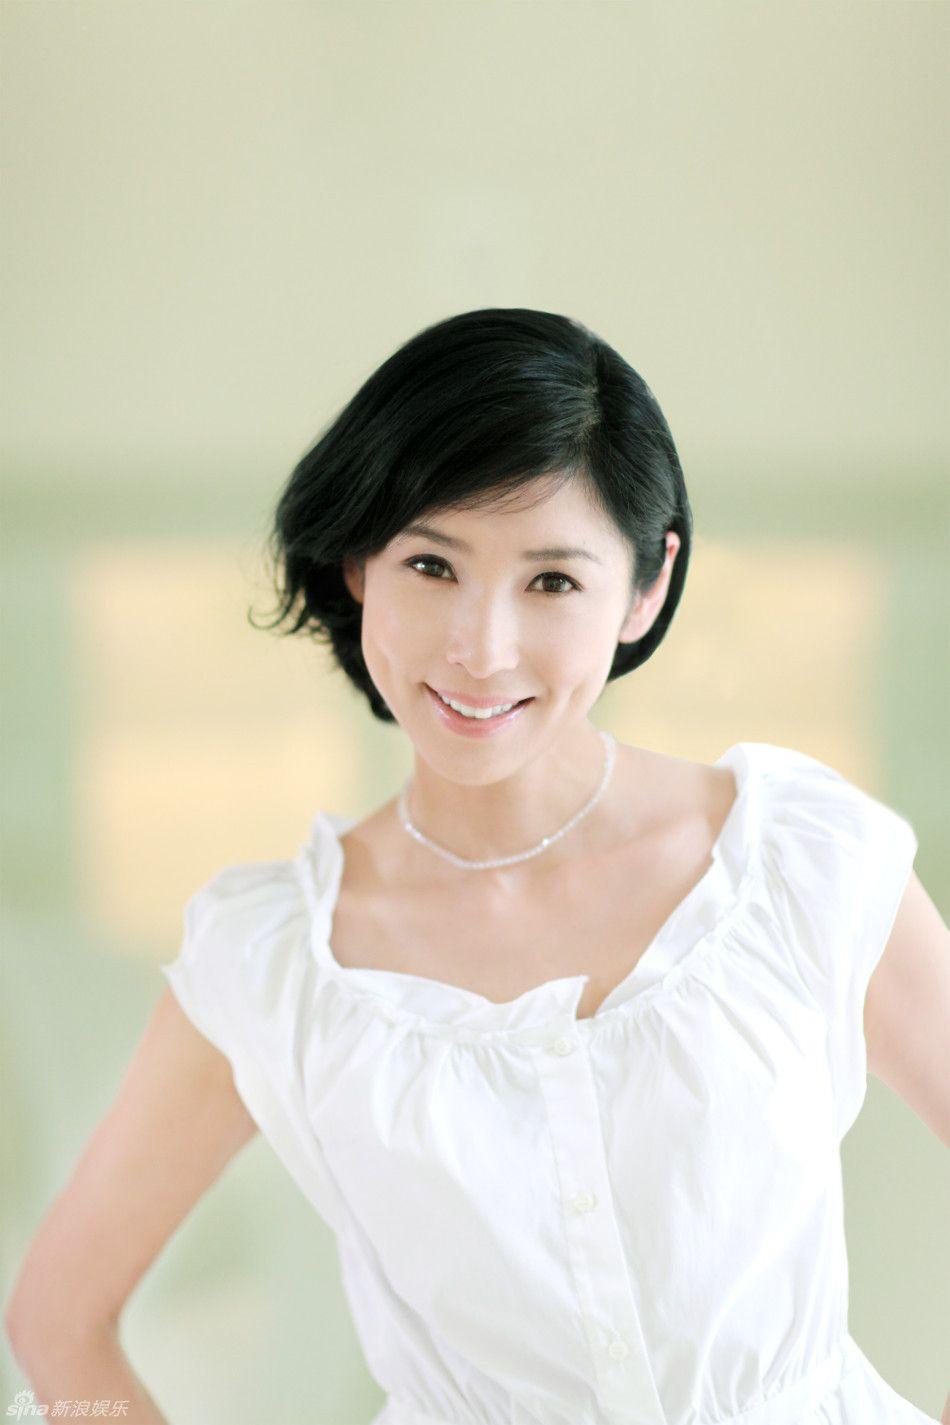 Hitomi Kuroki Hitomi Kuroki new foto